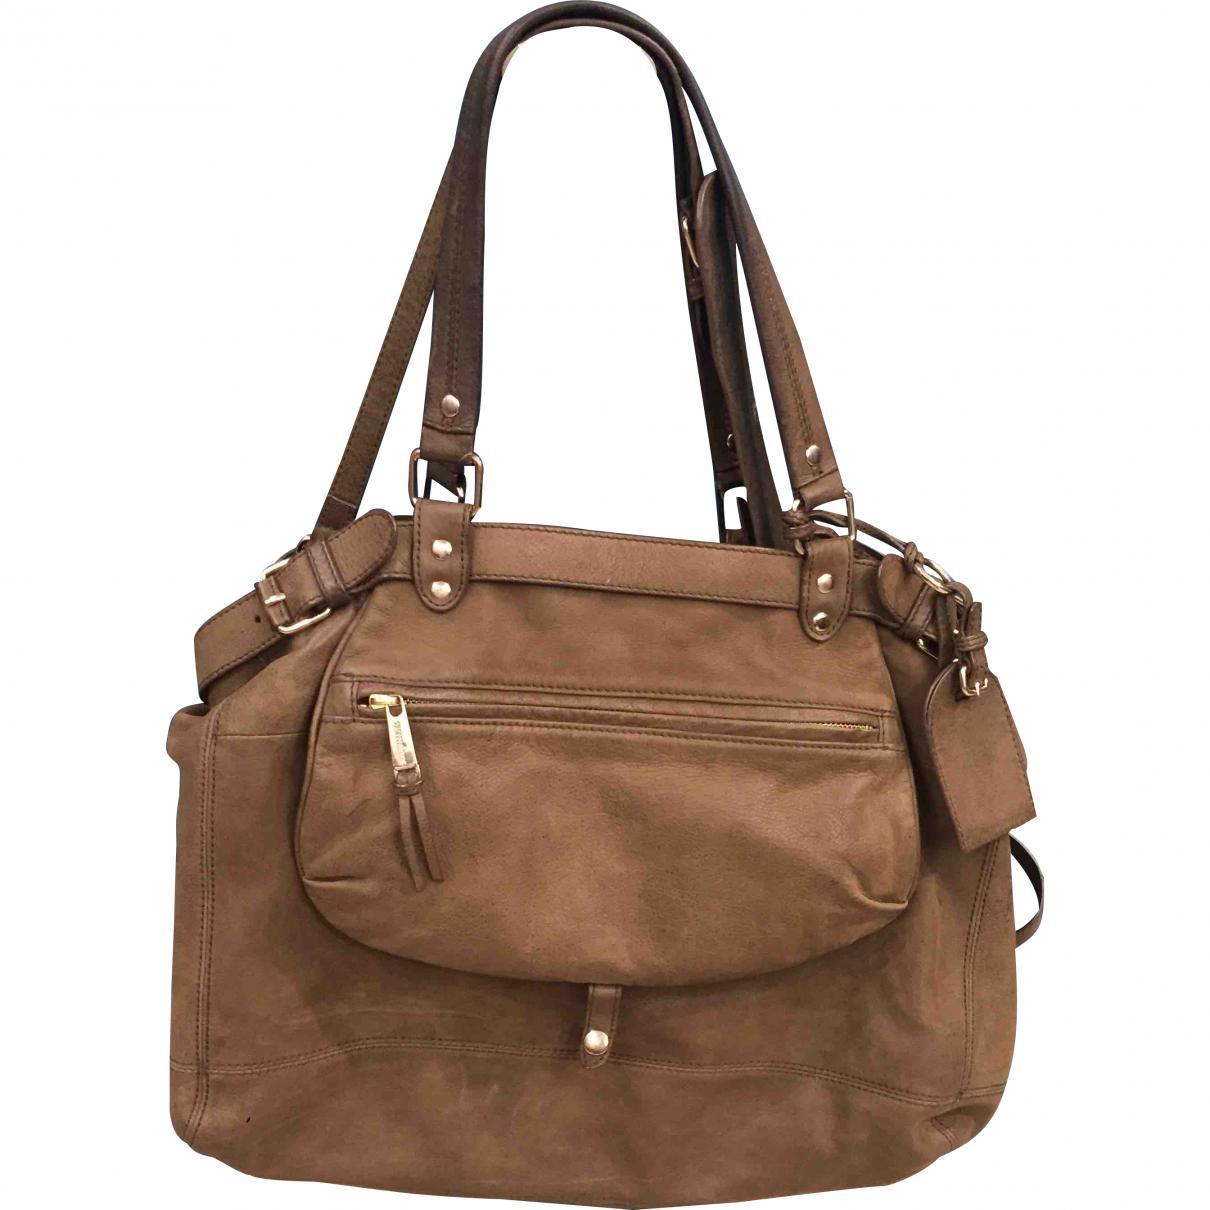 Vanessa Bruno Pre-owned - Brown Leather Handbag uufLNF